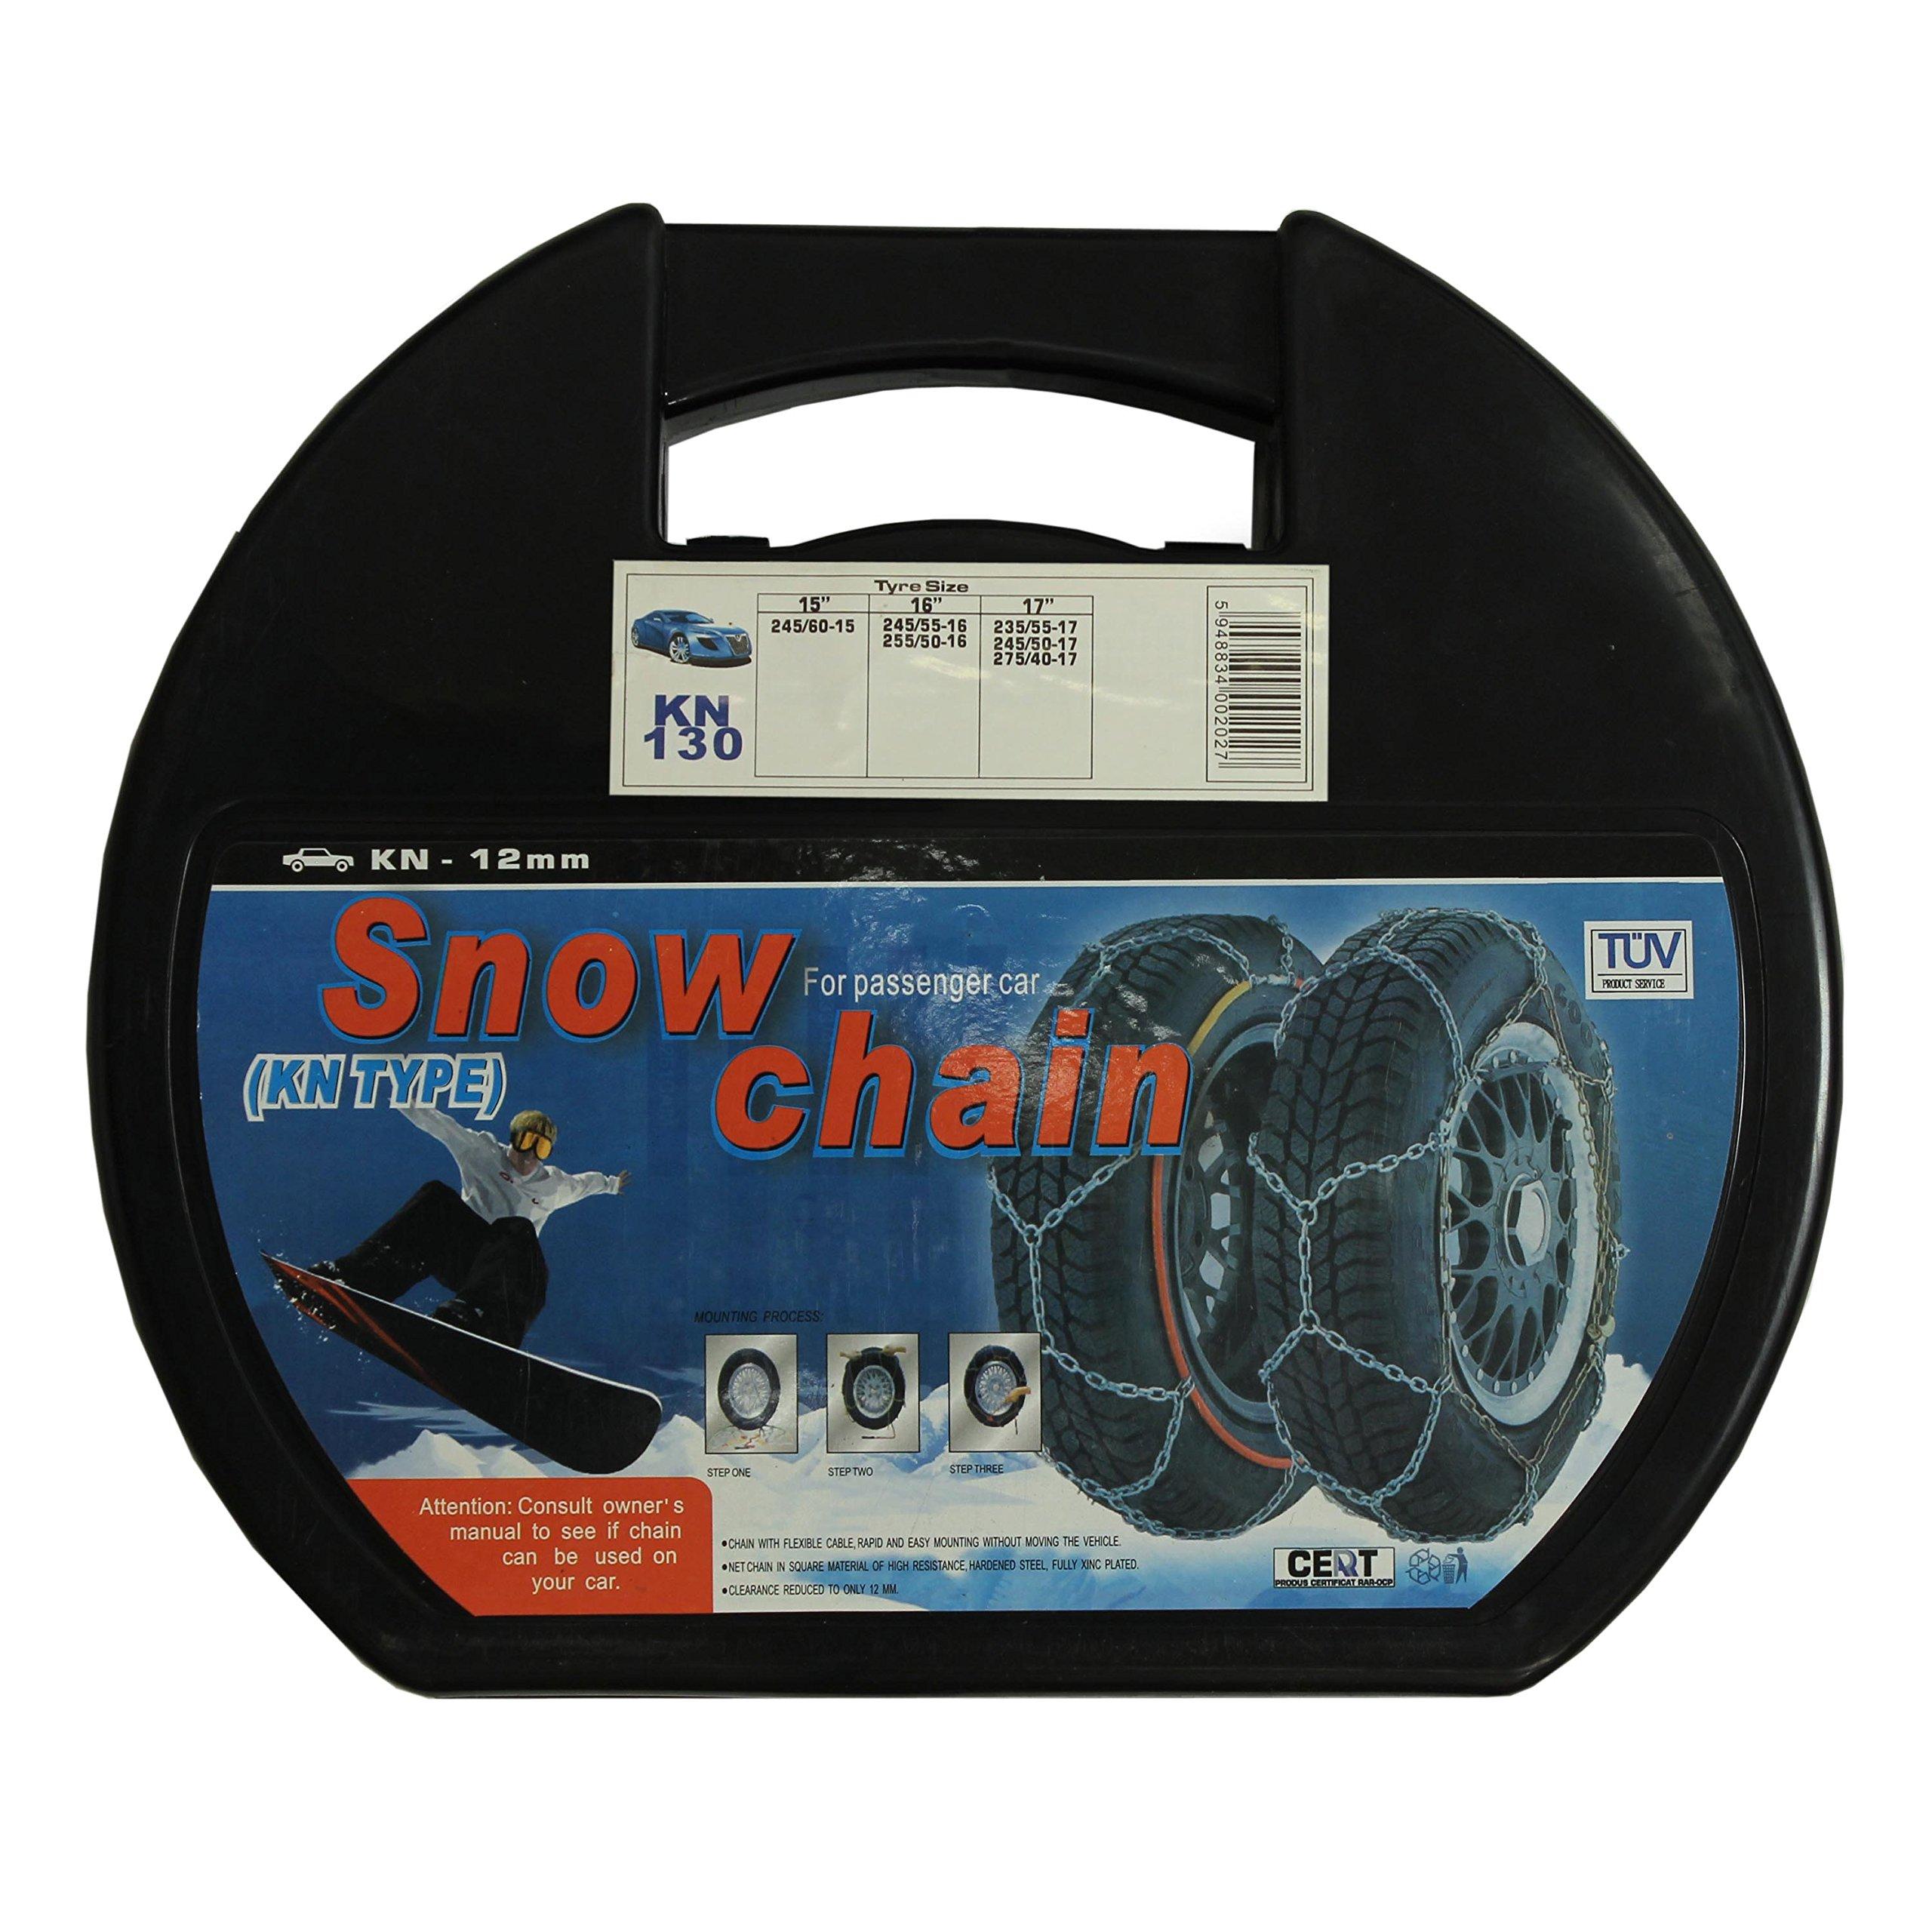 ALEKO 12mm Passenger Car Snow Chain, Pair of Size 130 Chains by ALEKO (Image #3)